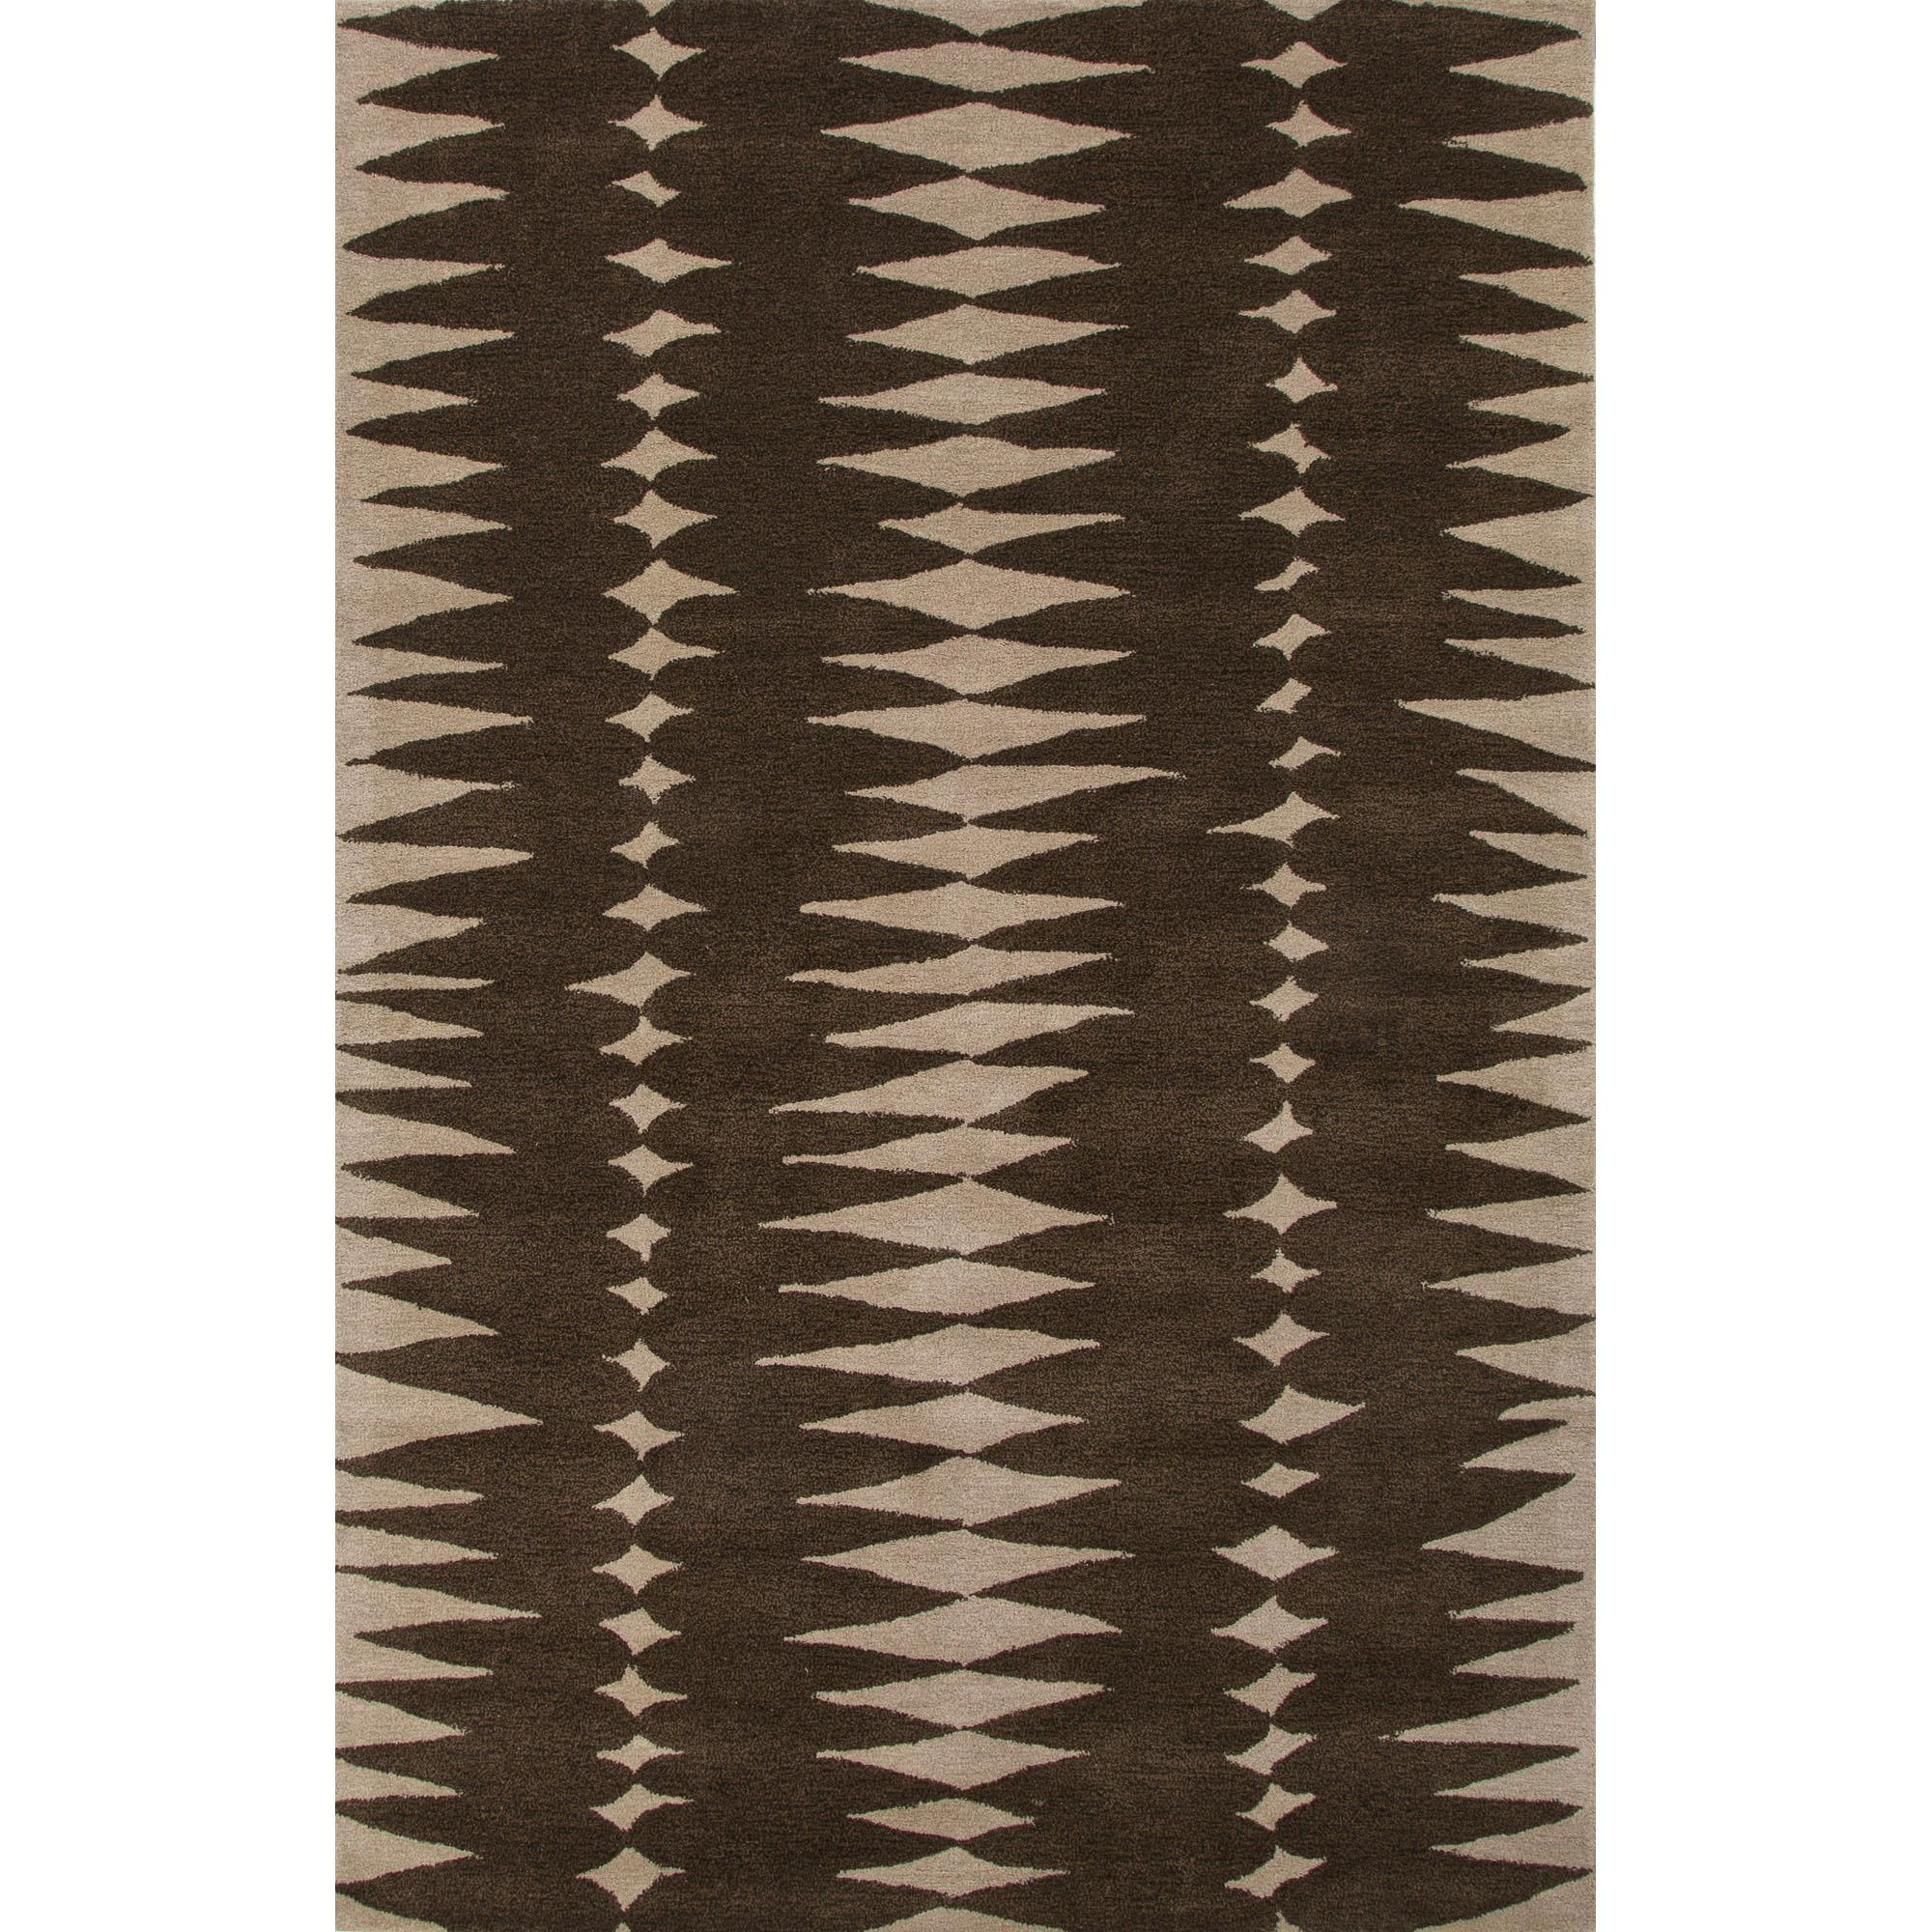 JAIPUR Rugs En Casa By Luli Sanchez Tufted 2 x 3 Rug - Item Number: RUG116808